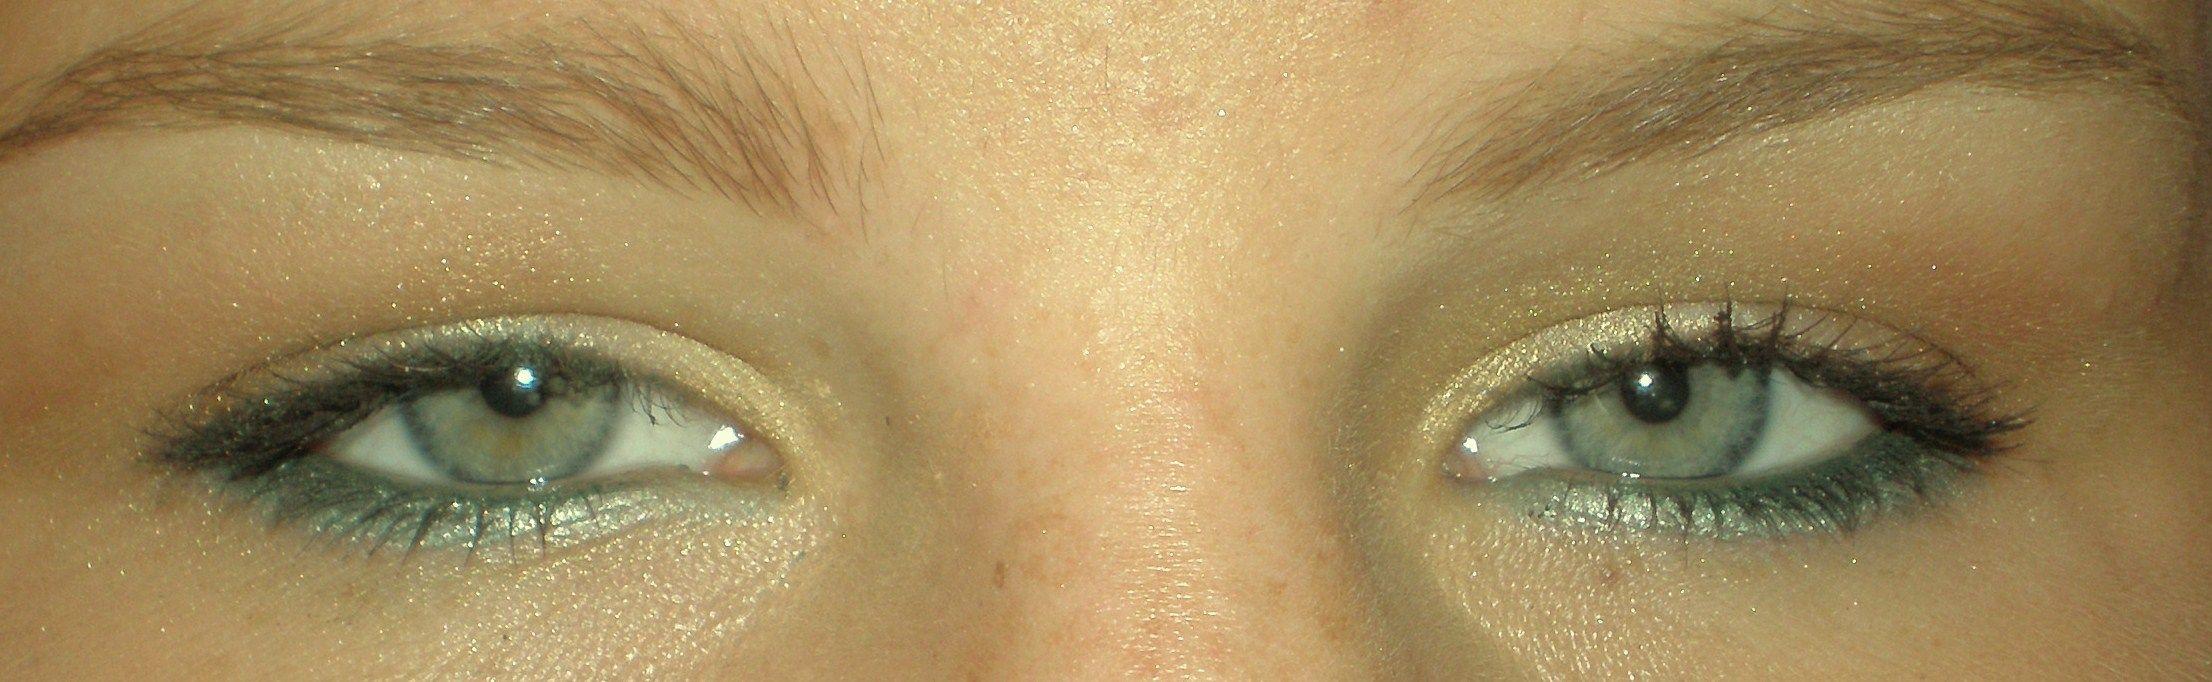 Great eyes!